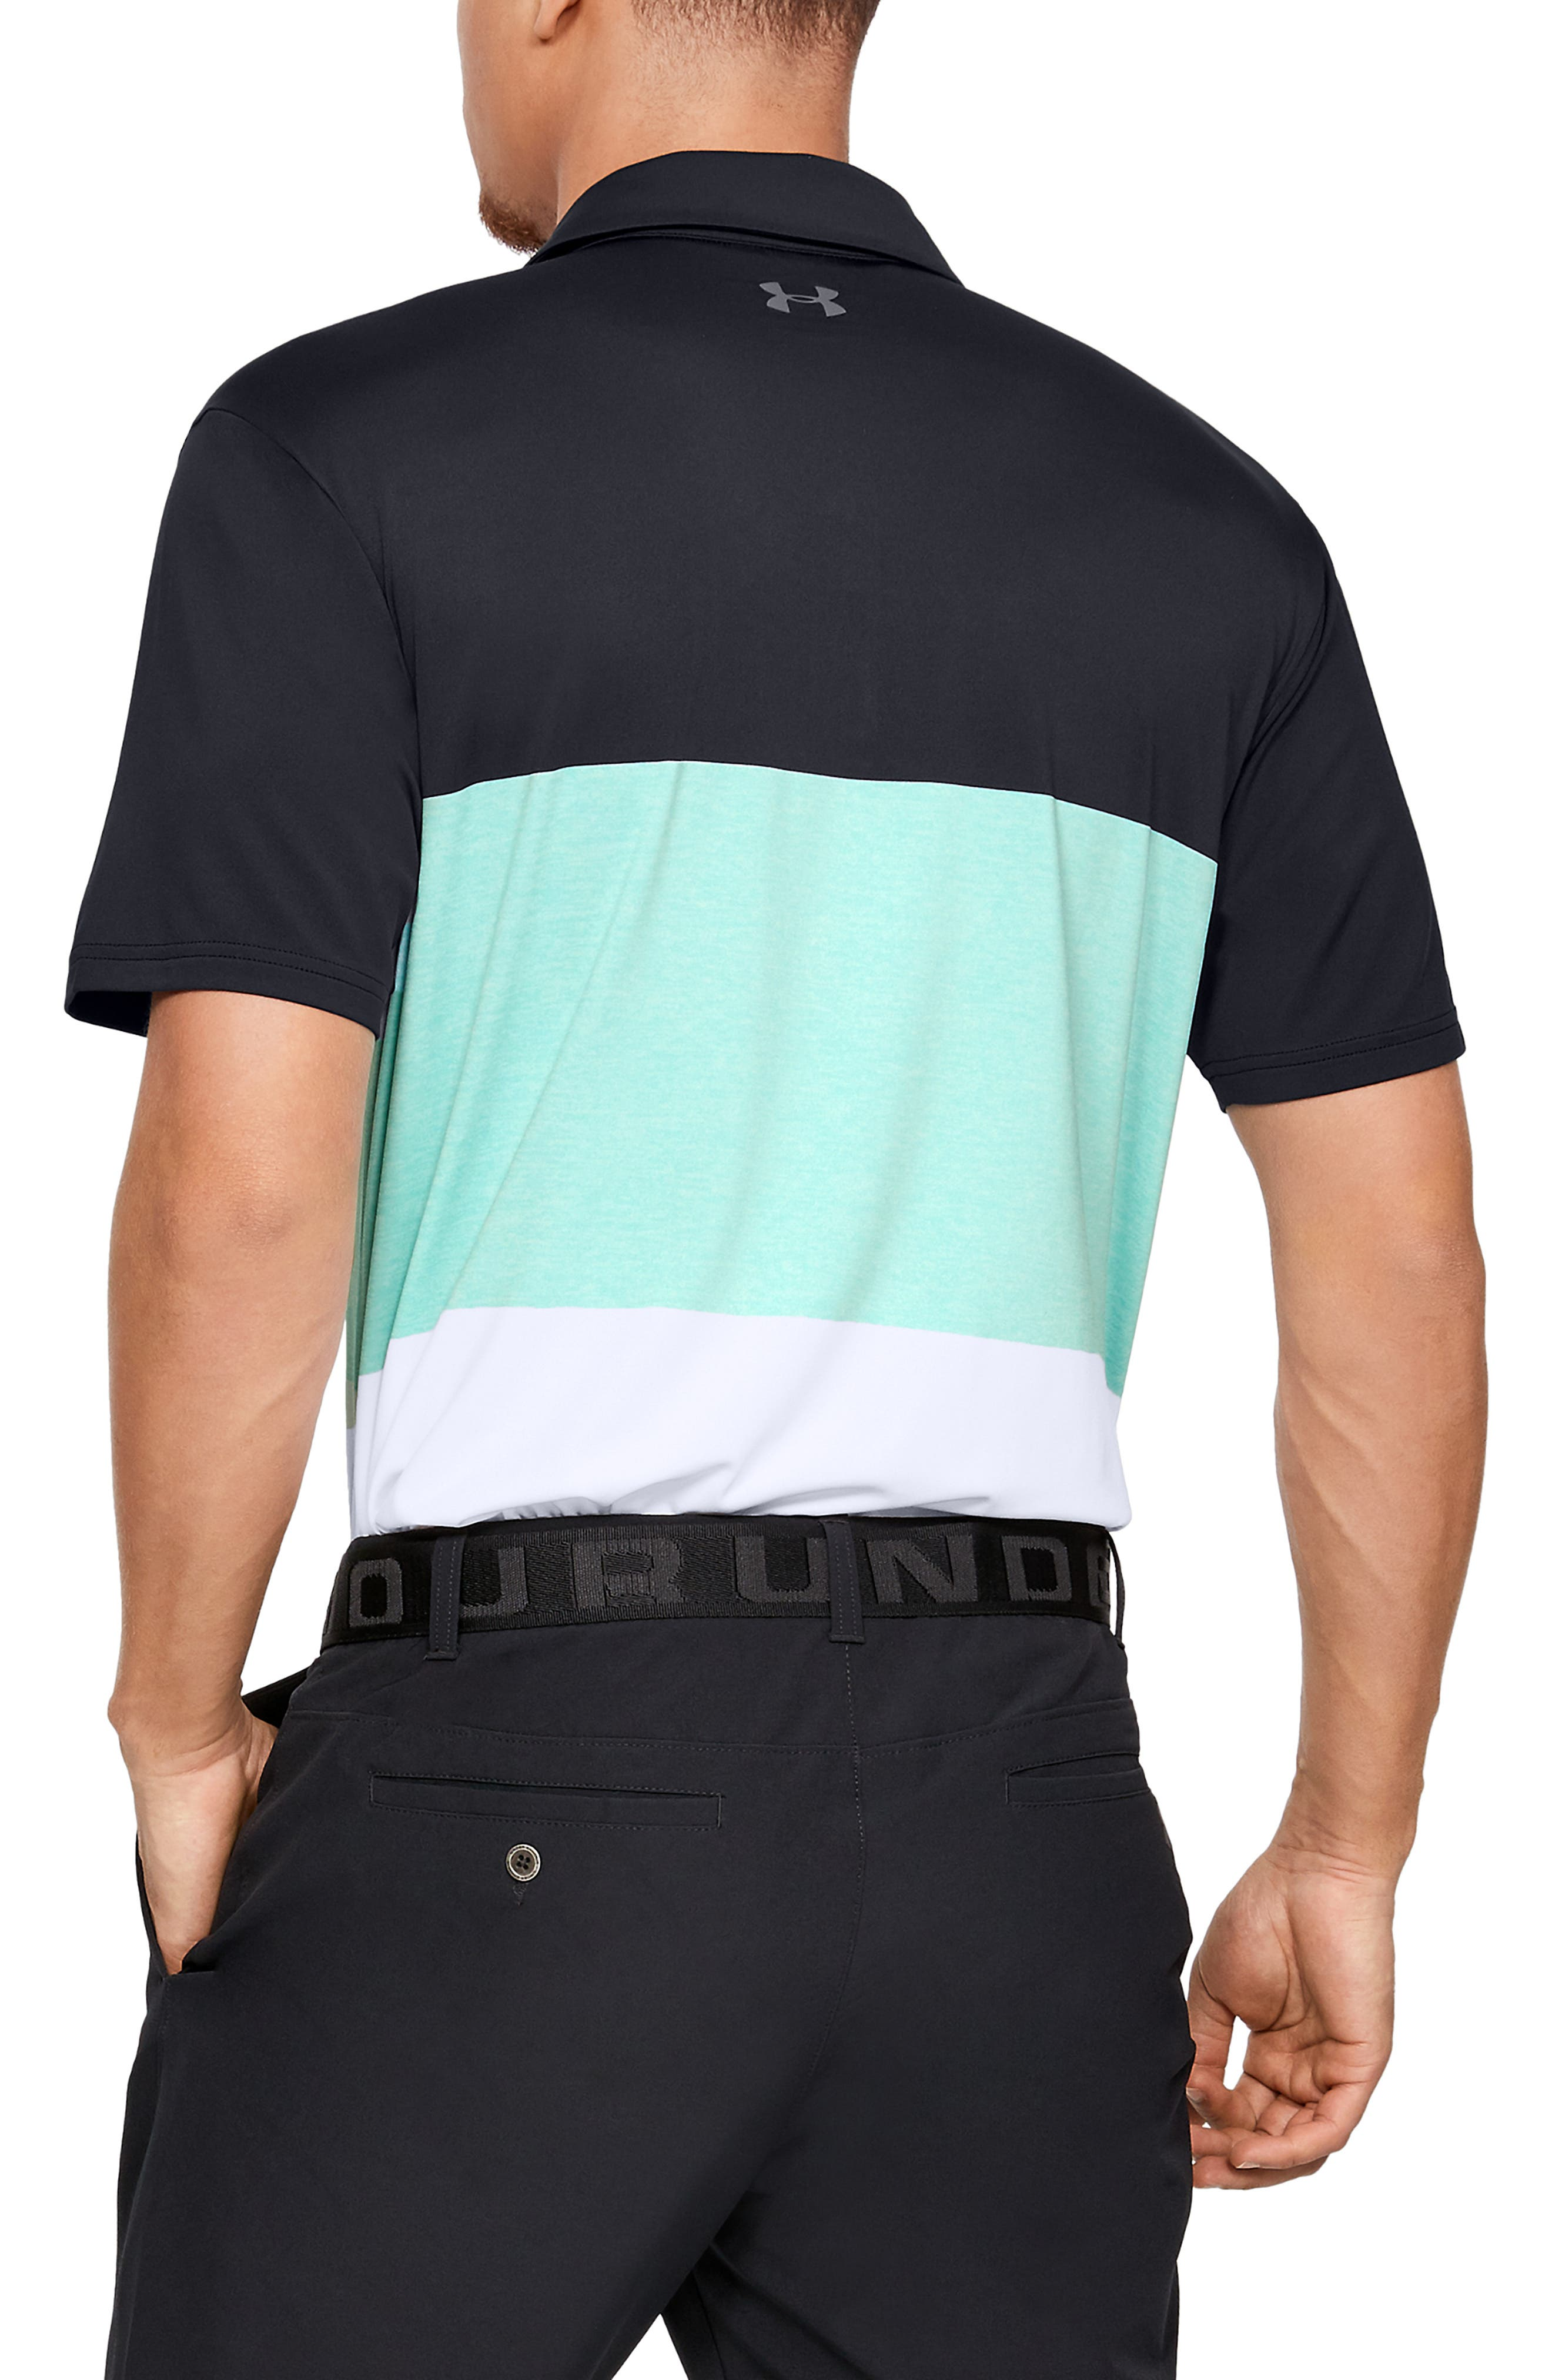 5655889c6 Under Armour Men s Clothing